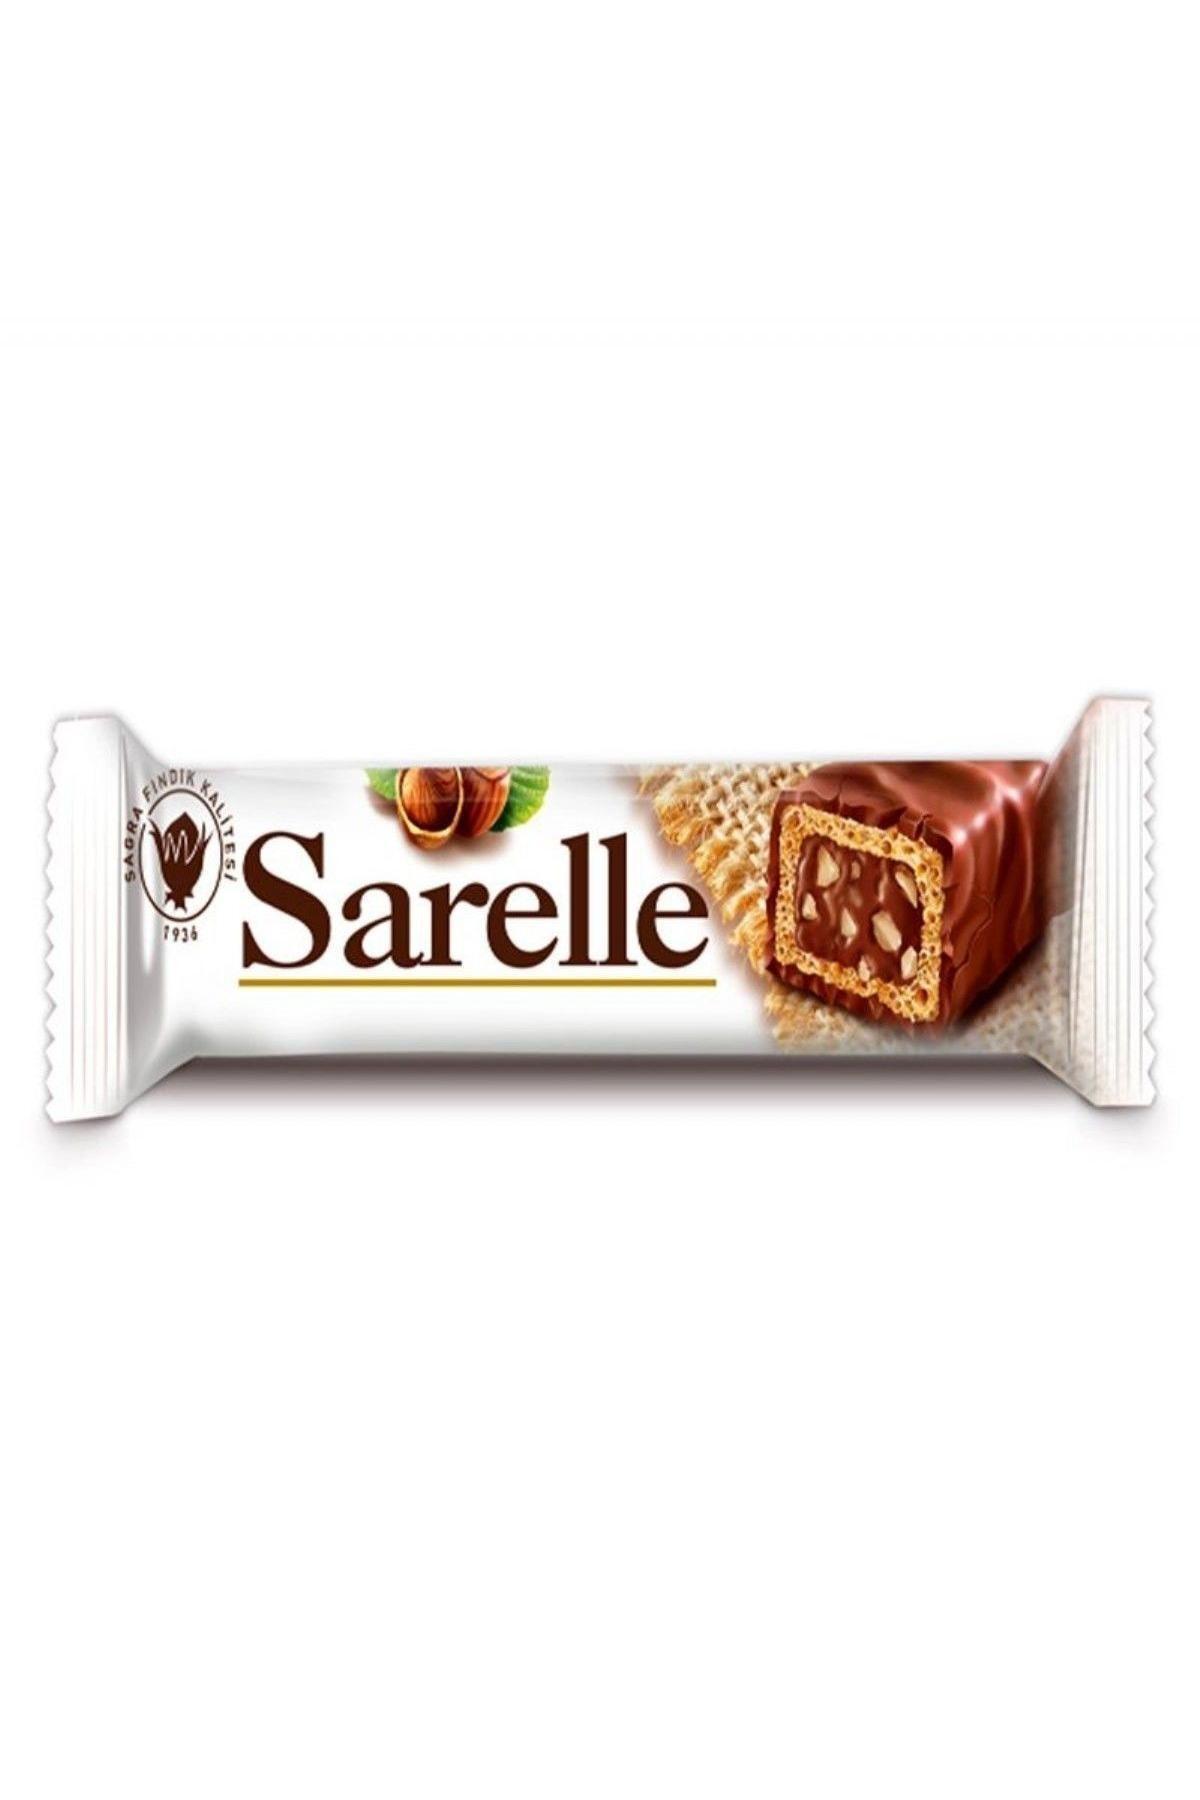 Sarelle Gold Çikolatalı Gofret 33 gr 1